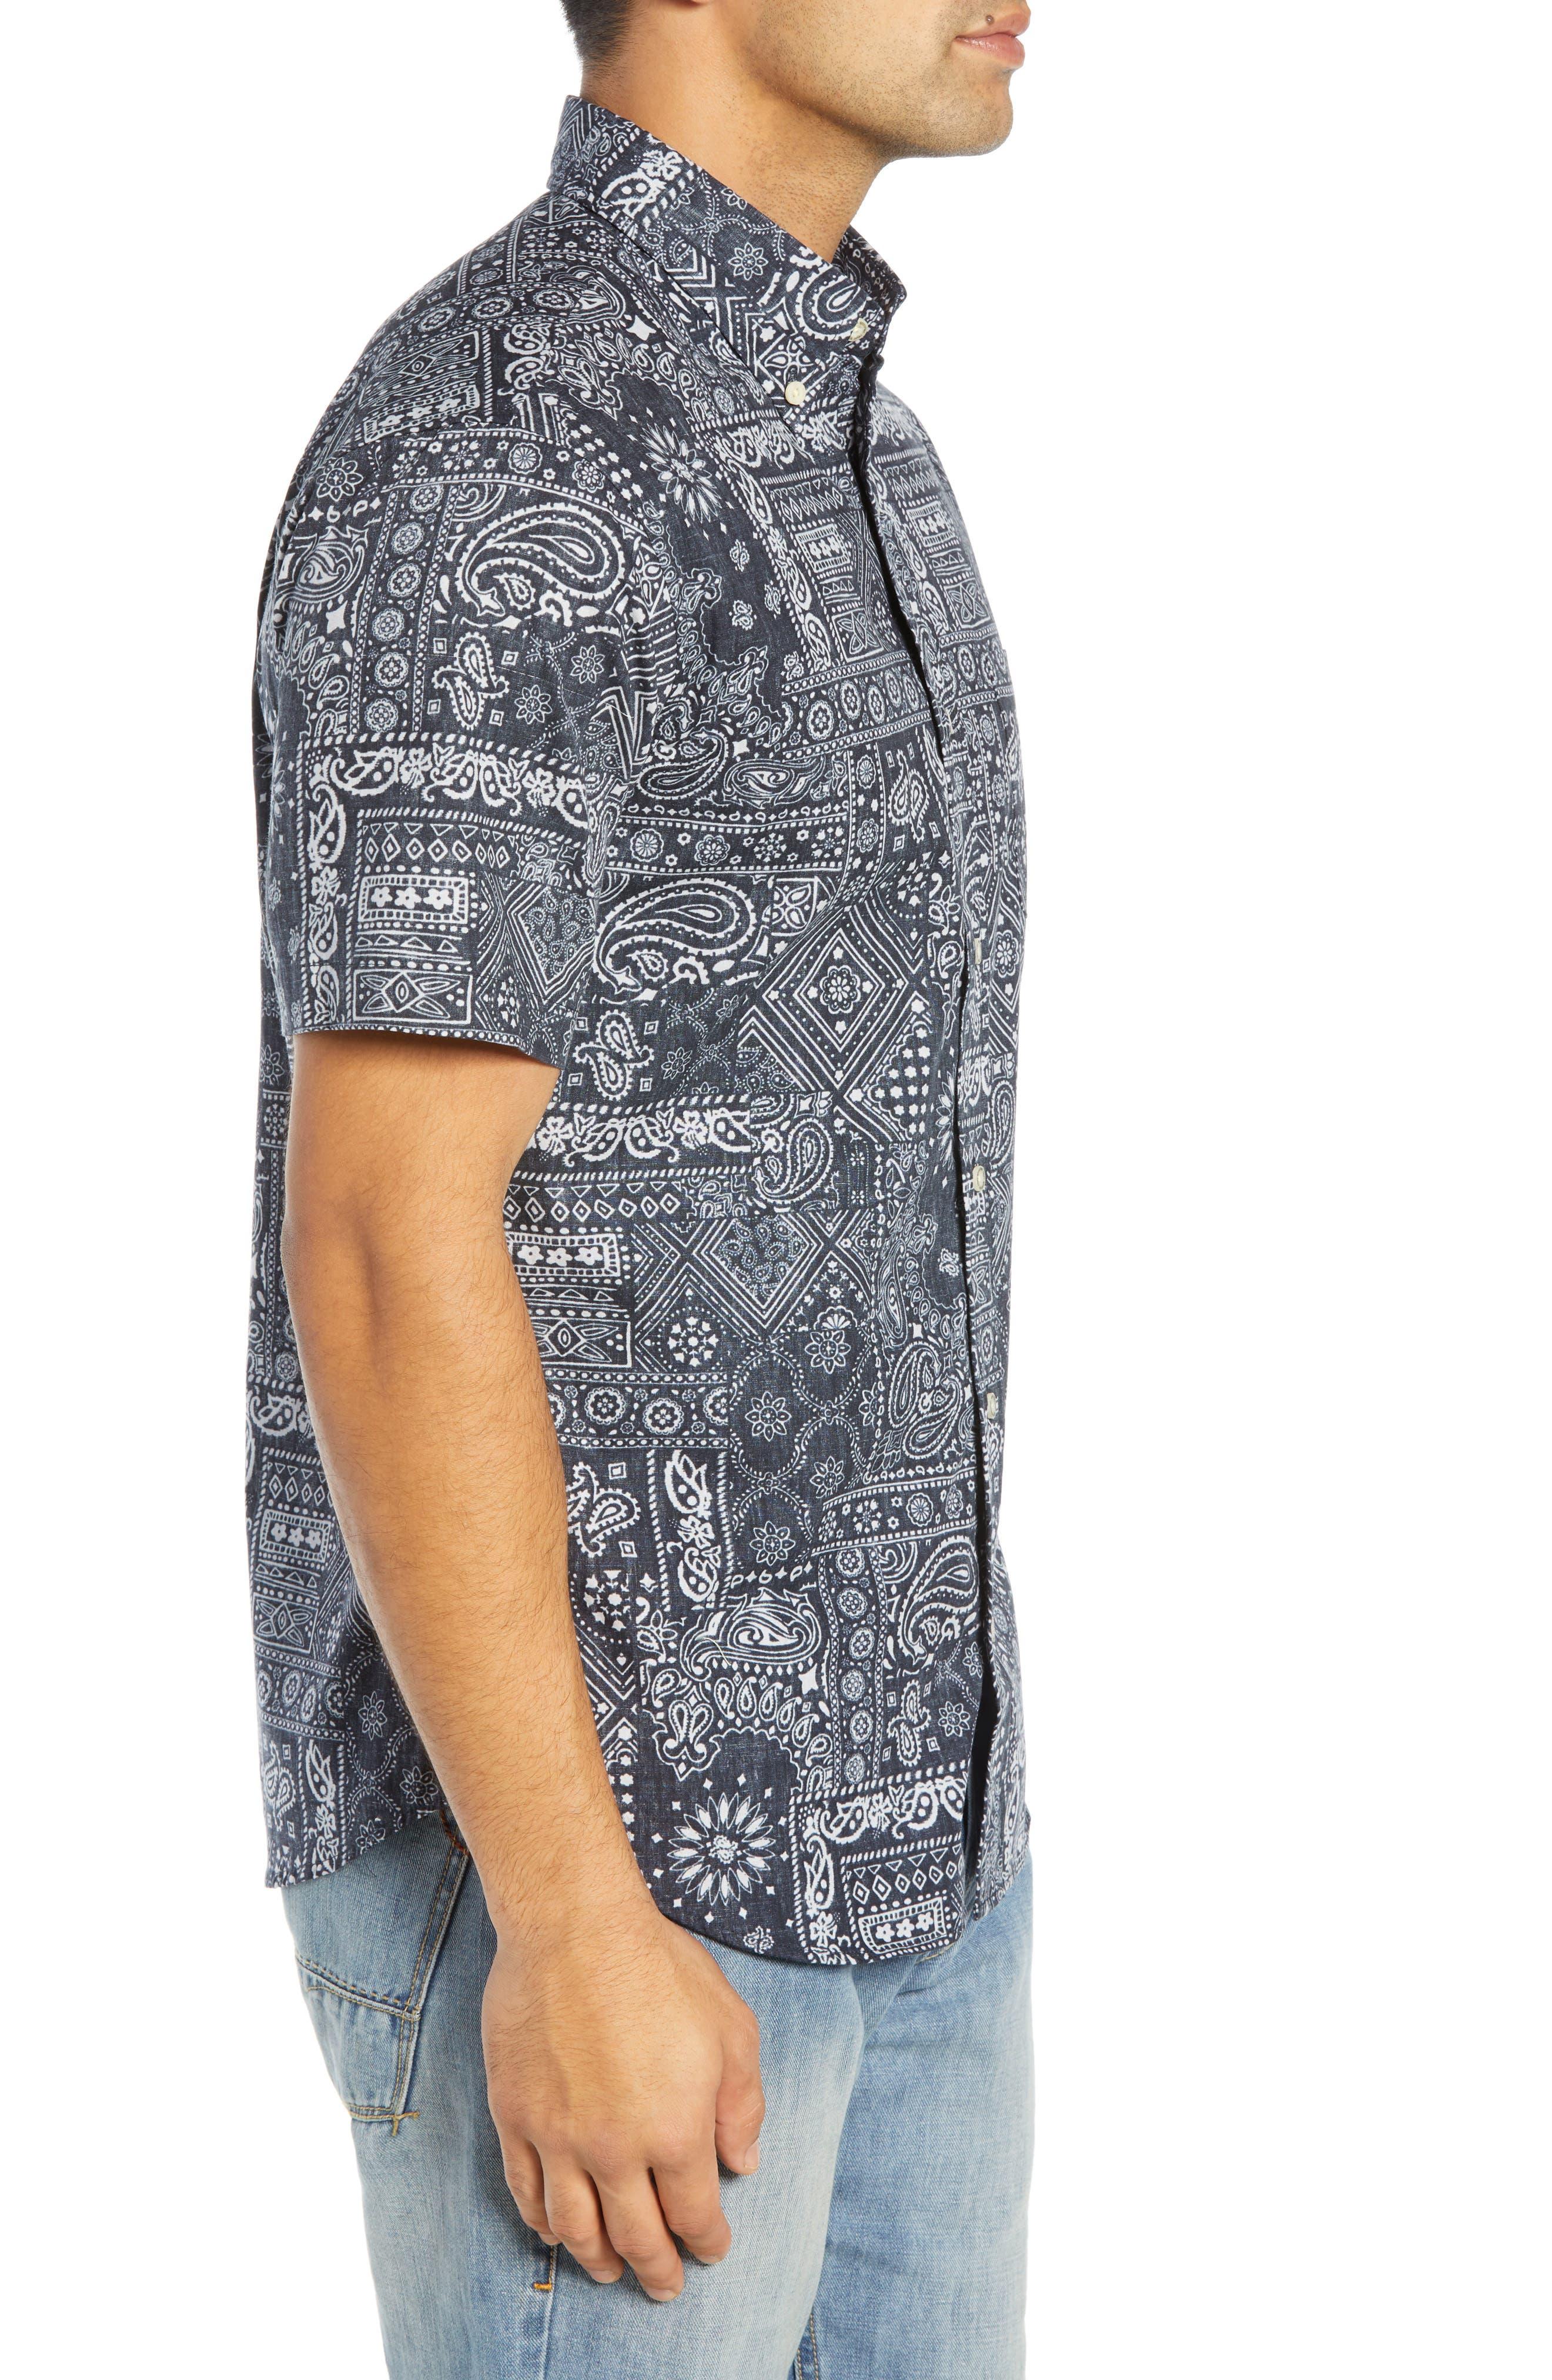 REYN SPOONER, Aloha Bandana Regular Fit Sport Shirt, Alternate thumbnail 4, color, 001